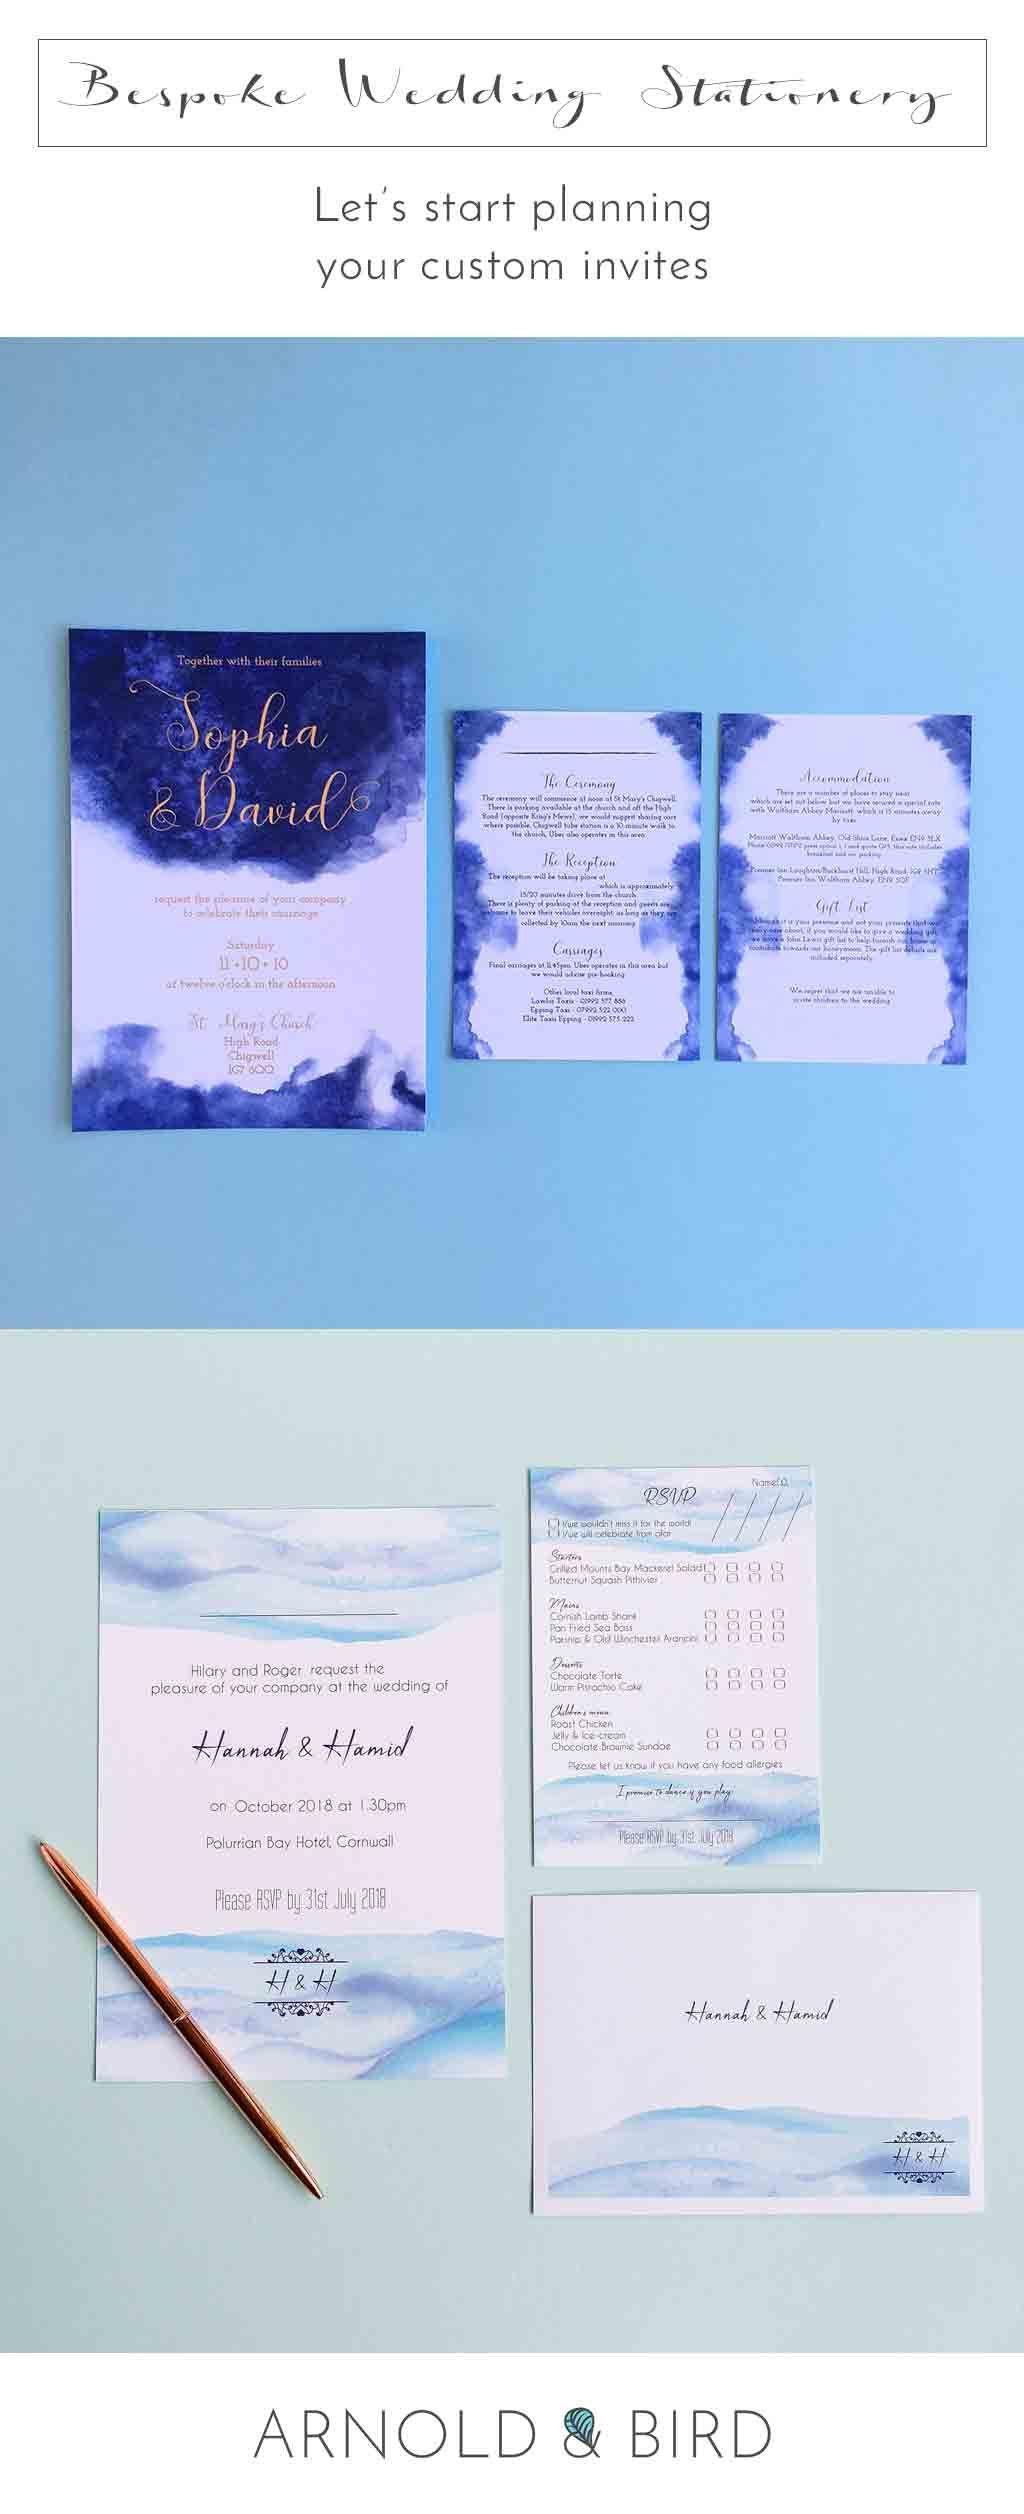 Bespoke Wedding Stationery Invites Personalised Invitations &